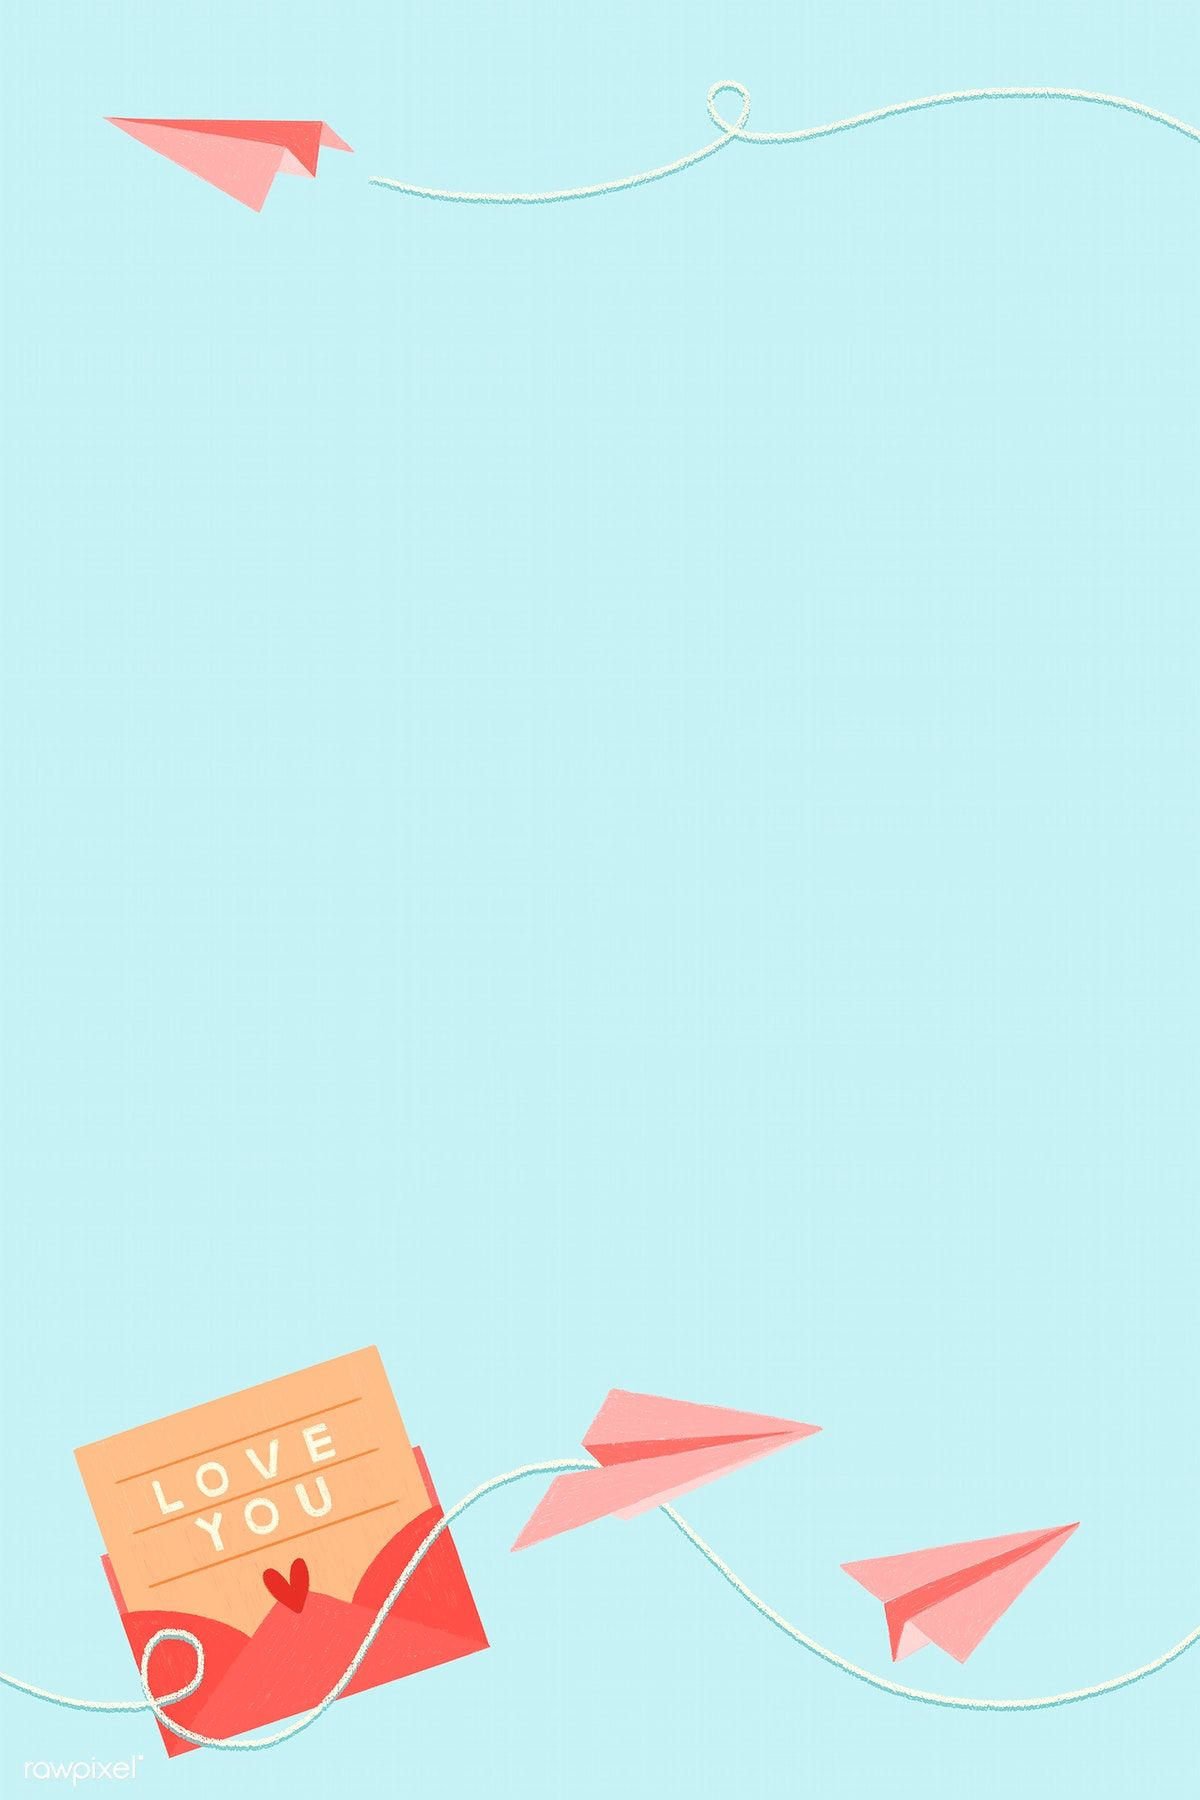 Download Premium Illustration Of Love Letter And Paper Plane Background Surat Cinta Ilustrasi Poster Ilustrasi